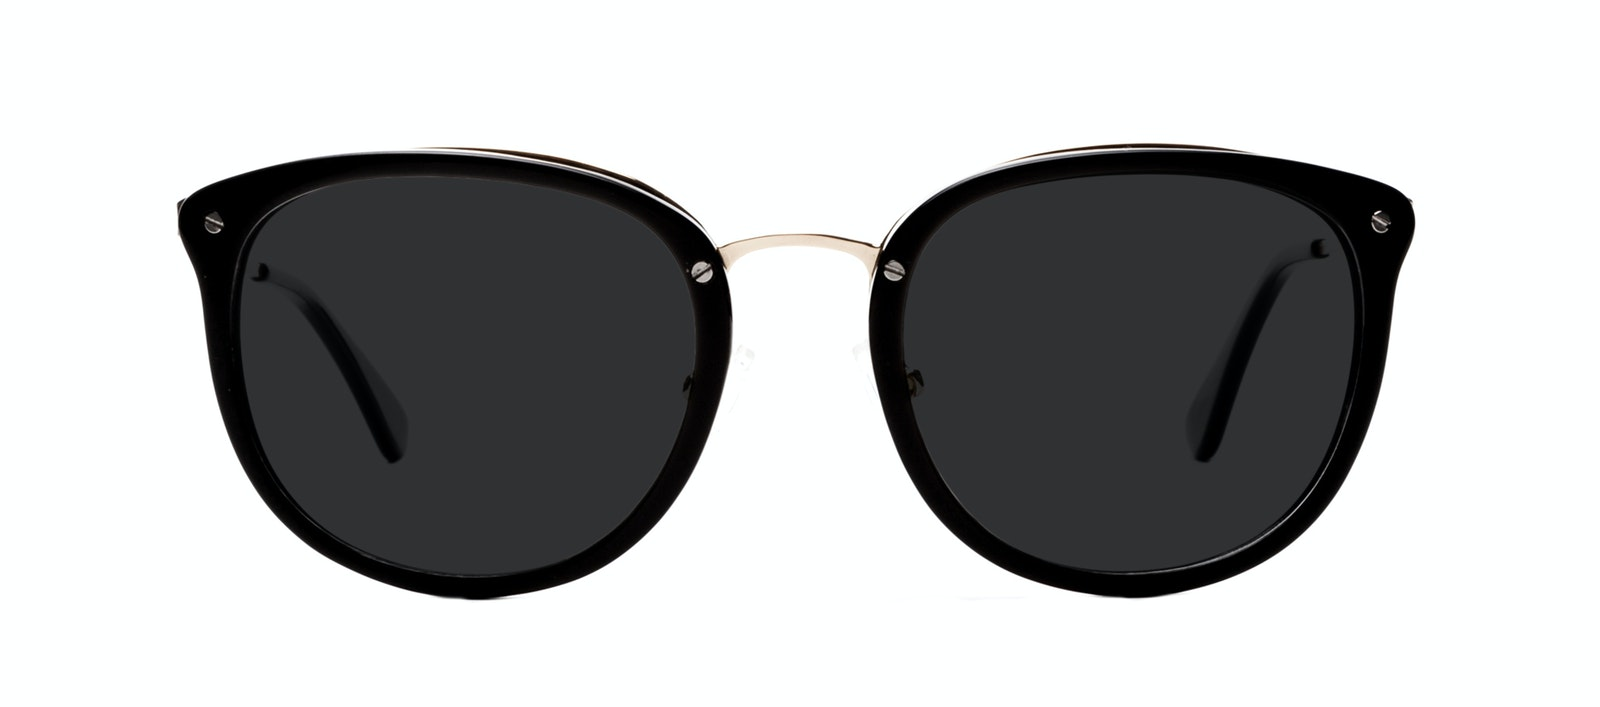 Affordable Fashion Glasses Square Round Sunglasses Women Amaze Onyx Front